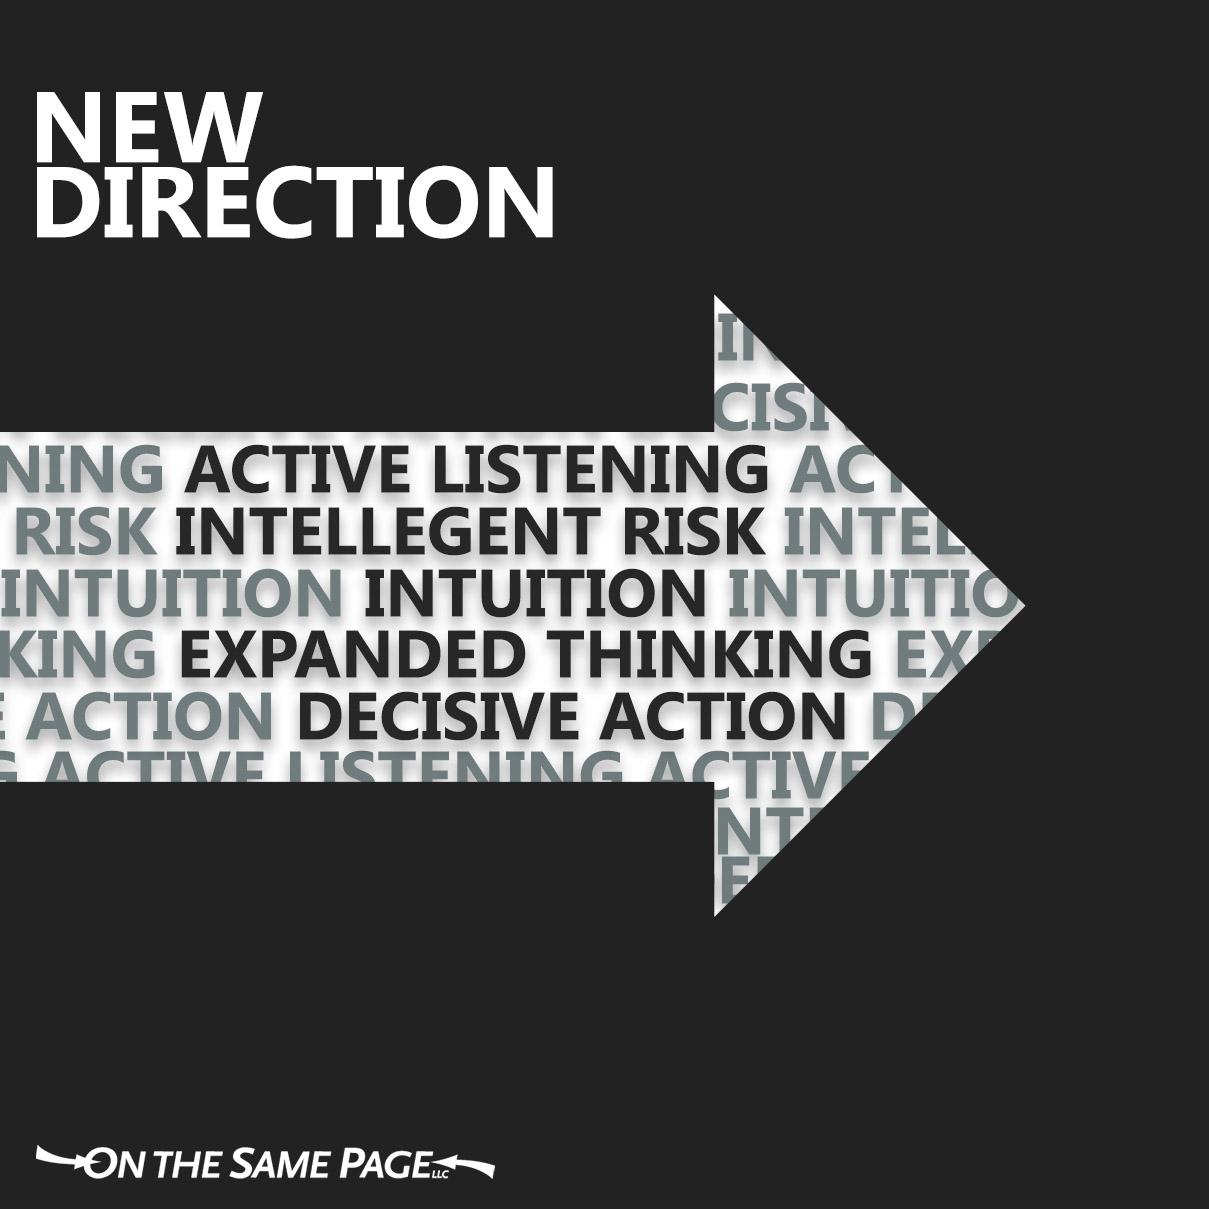 Change Communication - New Direction